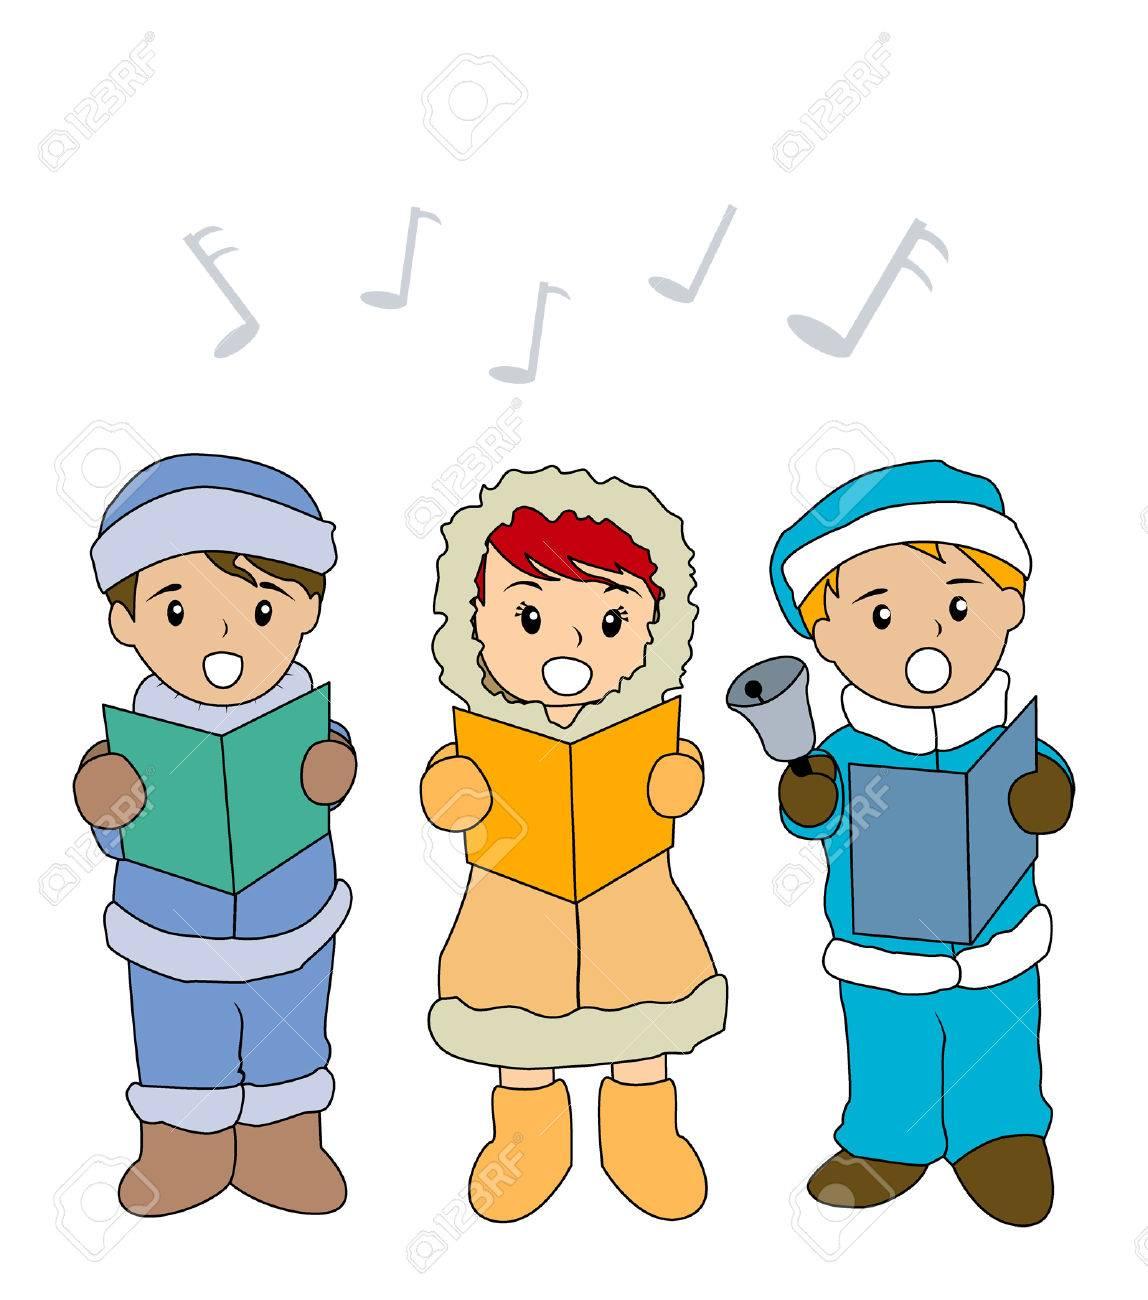 Illustration of Kids singing Christmas Carols Stock Vector - 1842442